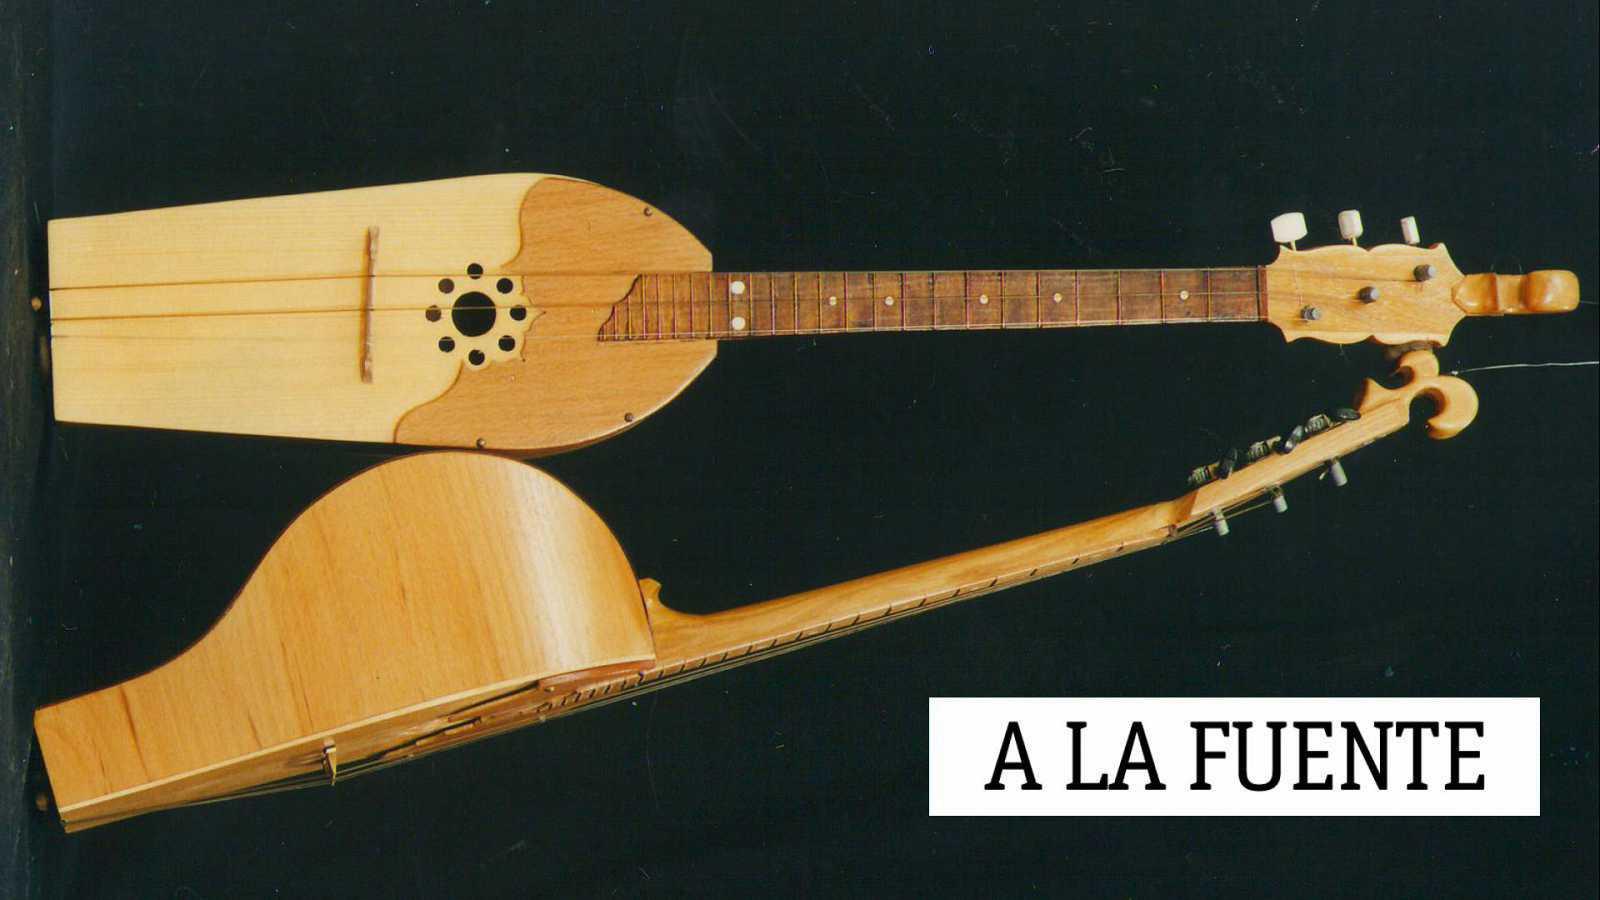 A la fuente - Tañendo palabras: pandura, bandura, bandurria, mandolina... - 07/06/20 - escuchar ahora